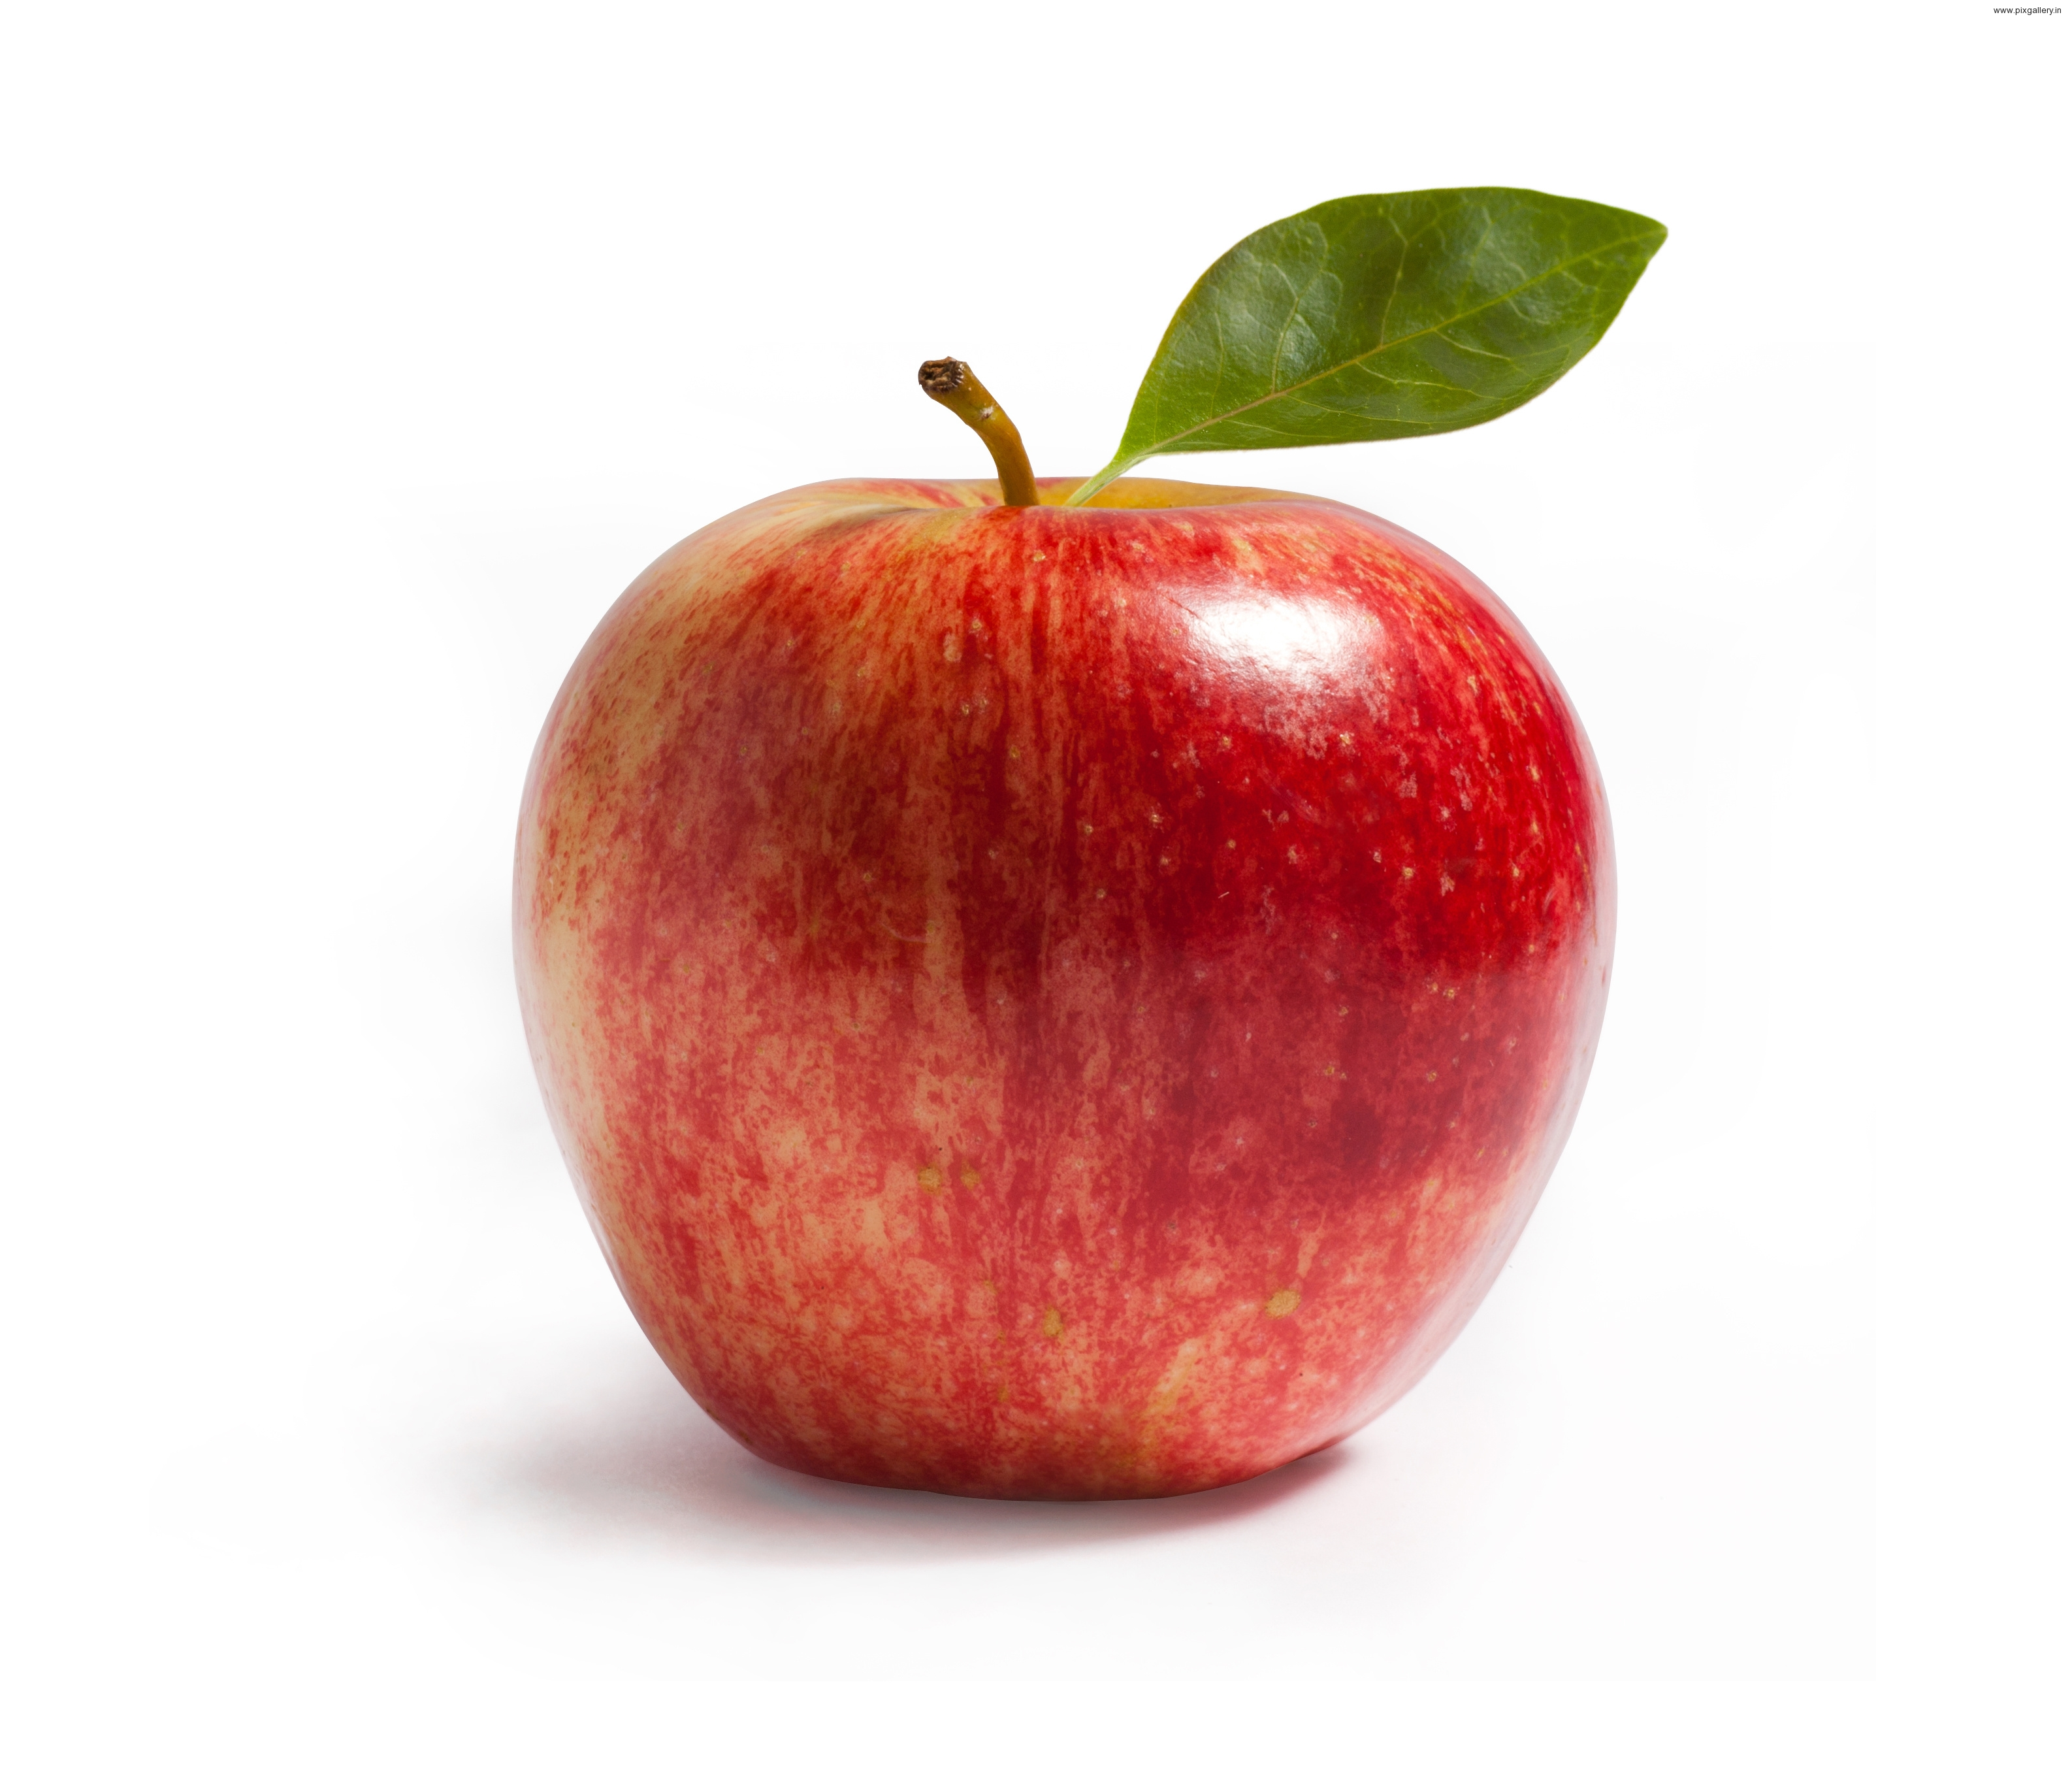 apple 7 global action plan